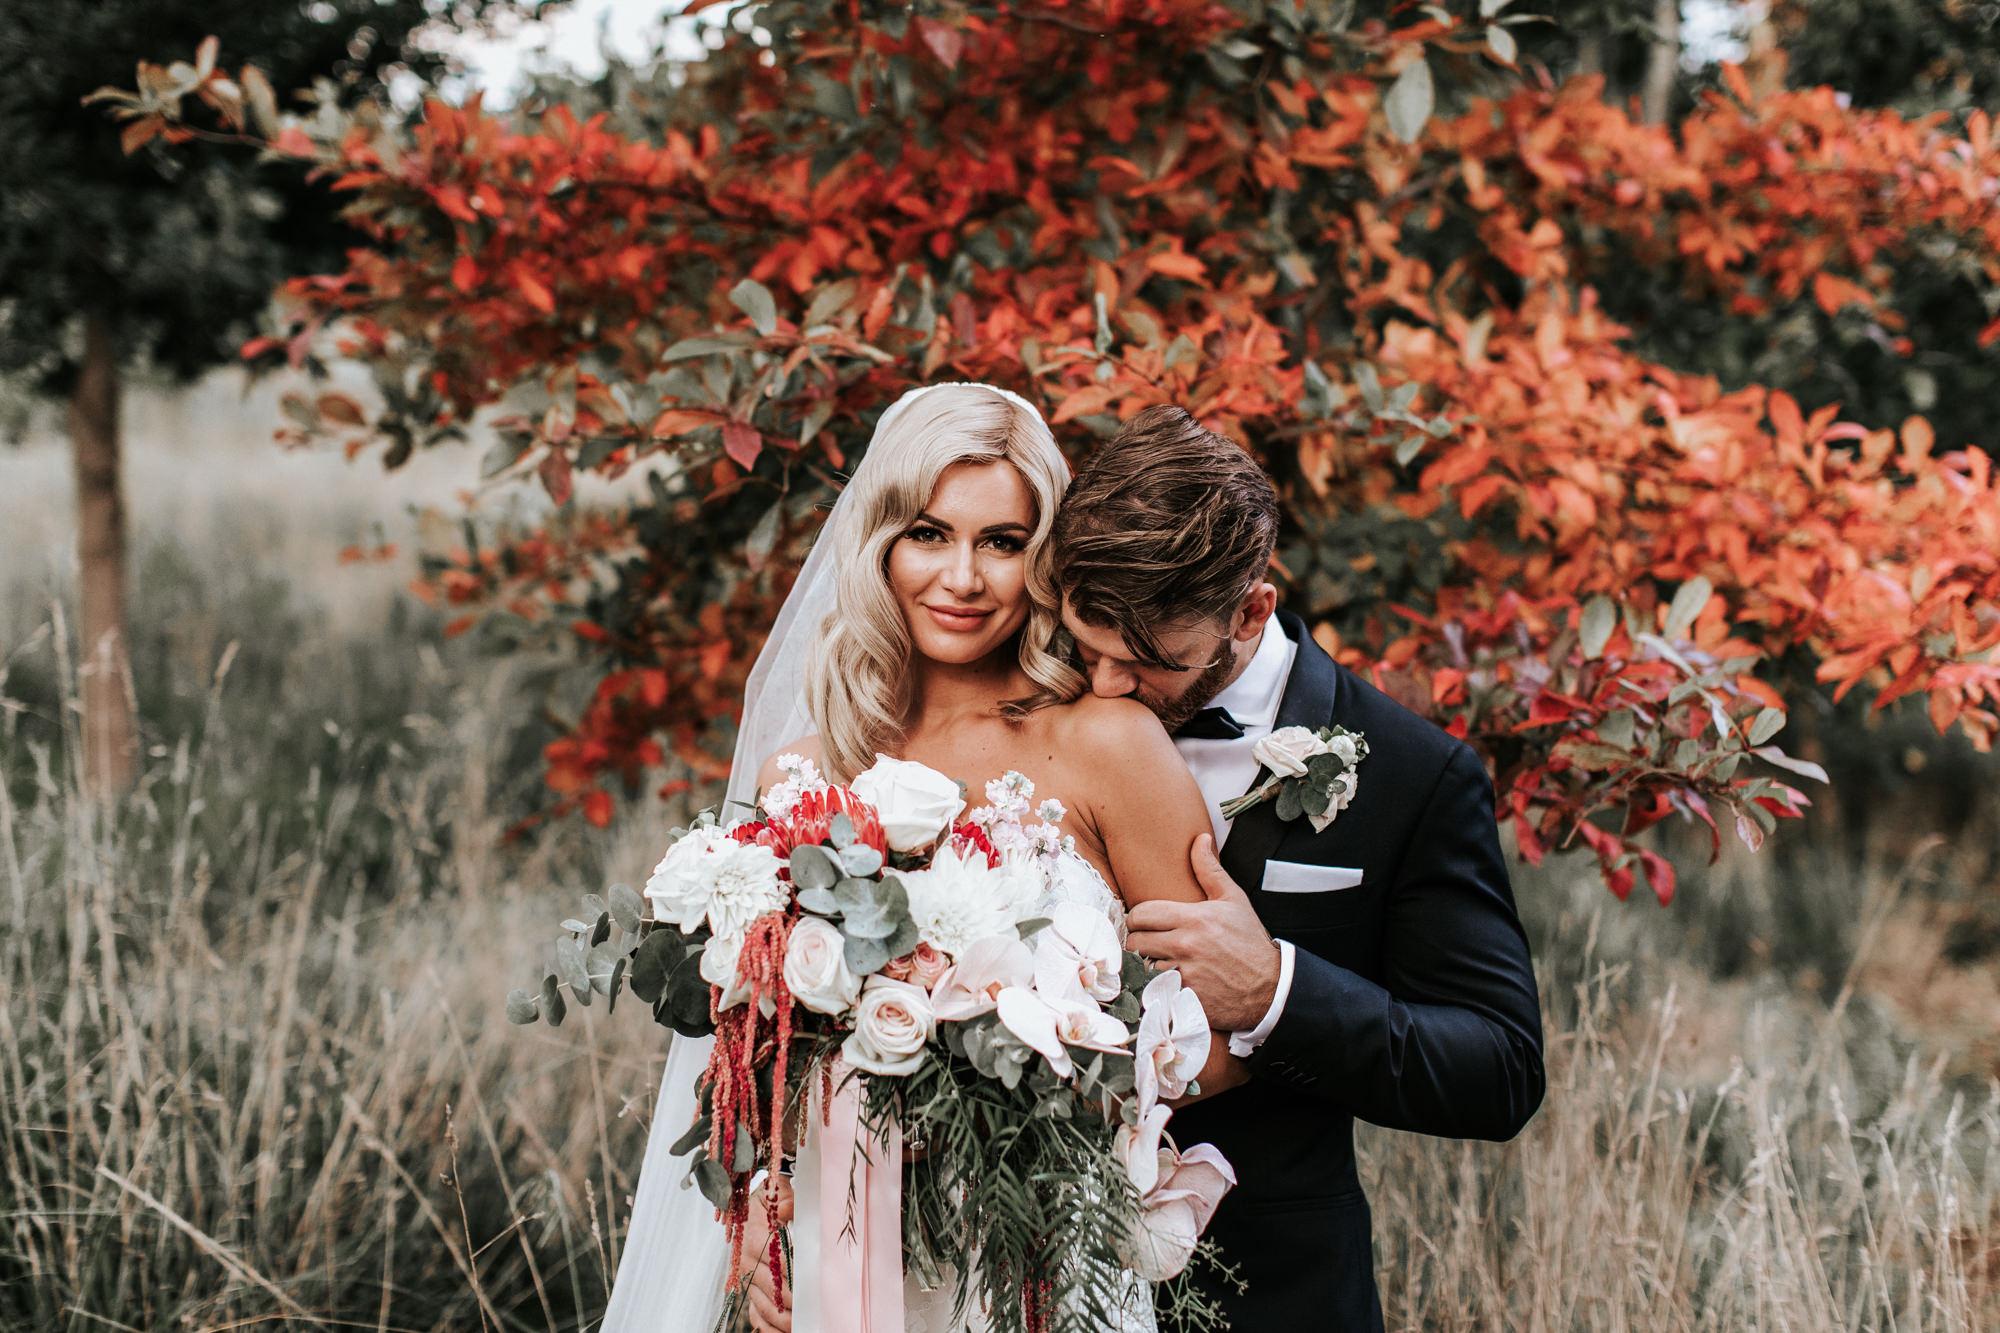 mali-brae-wedding-natalie-scott-baldwin-27.jpg